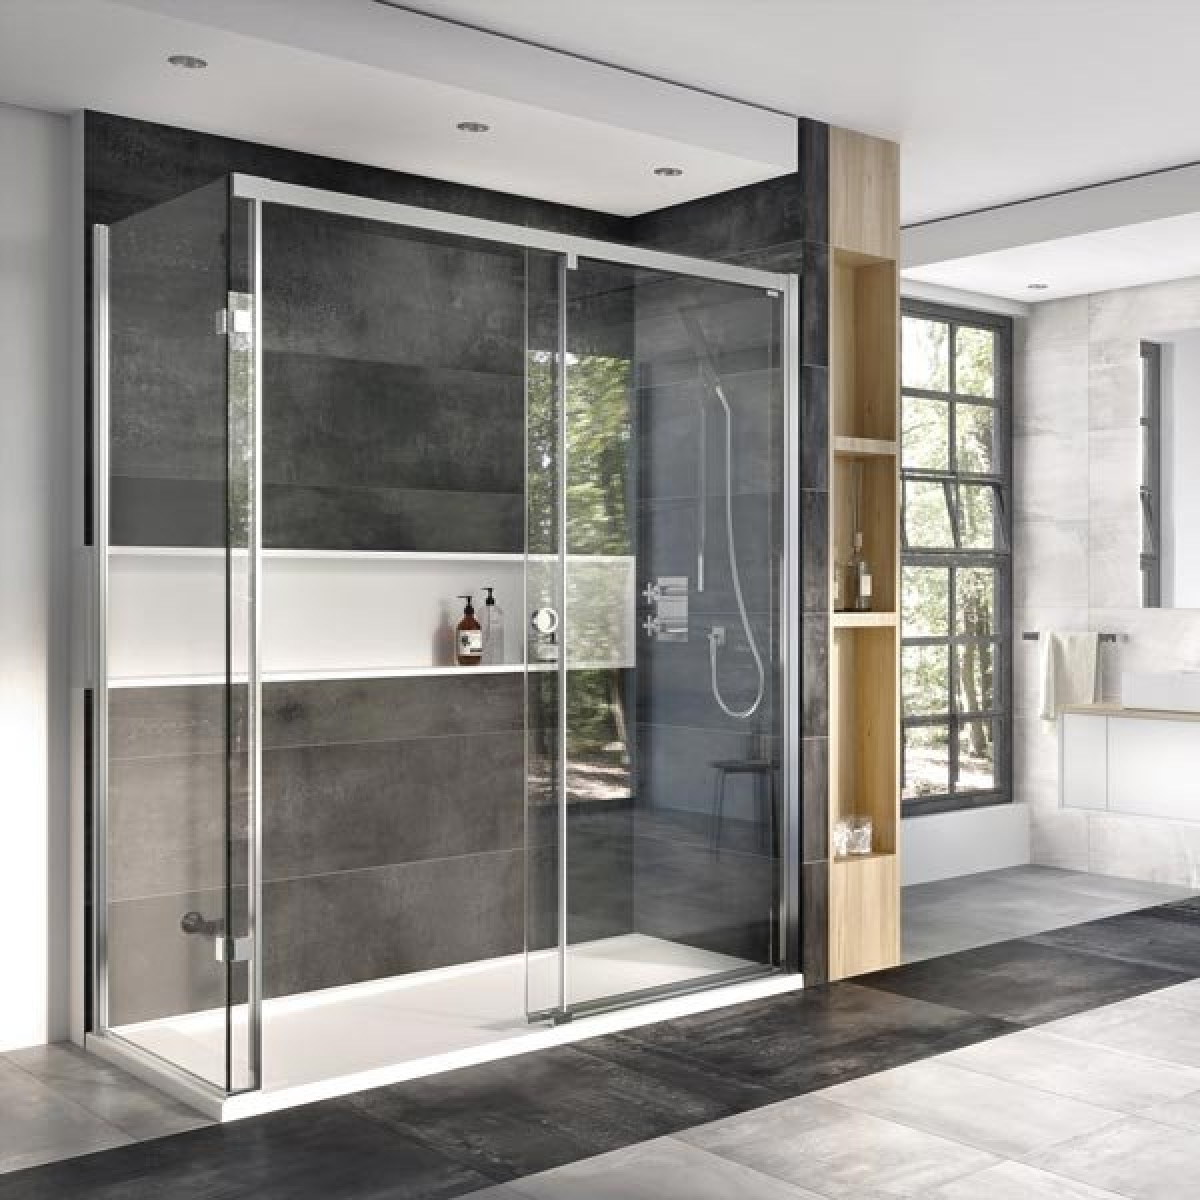 Roman Decem Level Access Sliding Door Corner Fitting